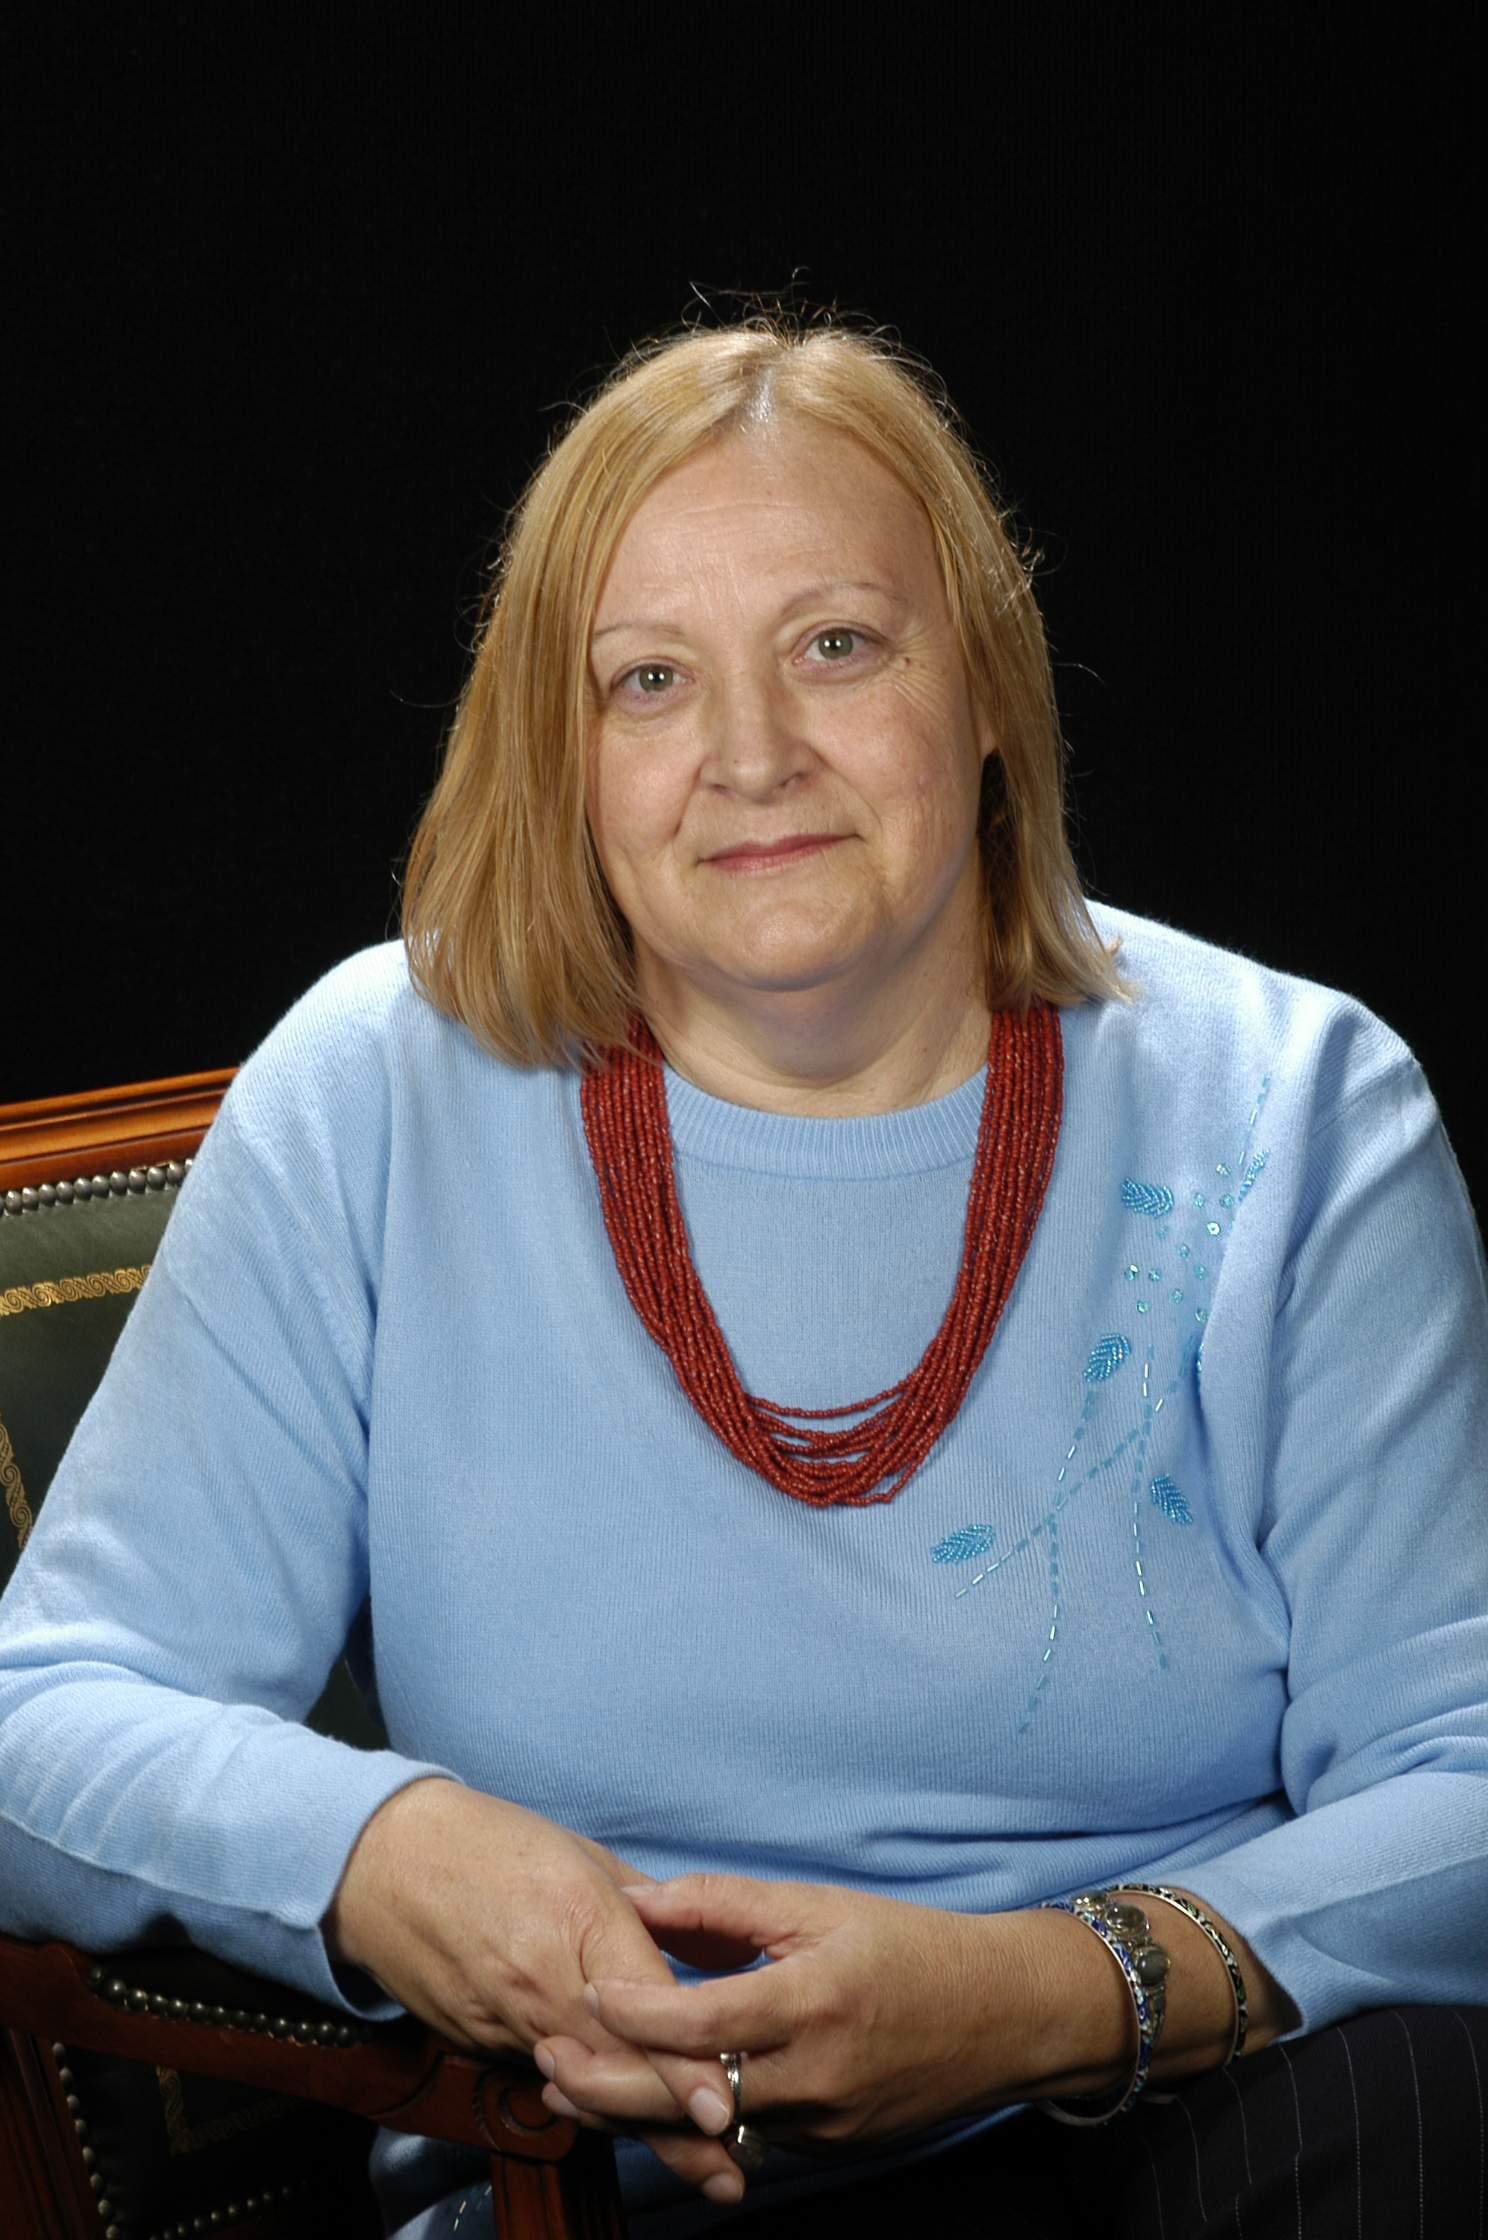 Dra. Maria R. Figueras Martorell